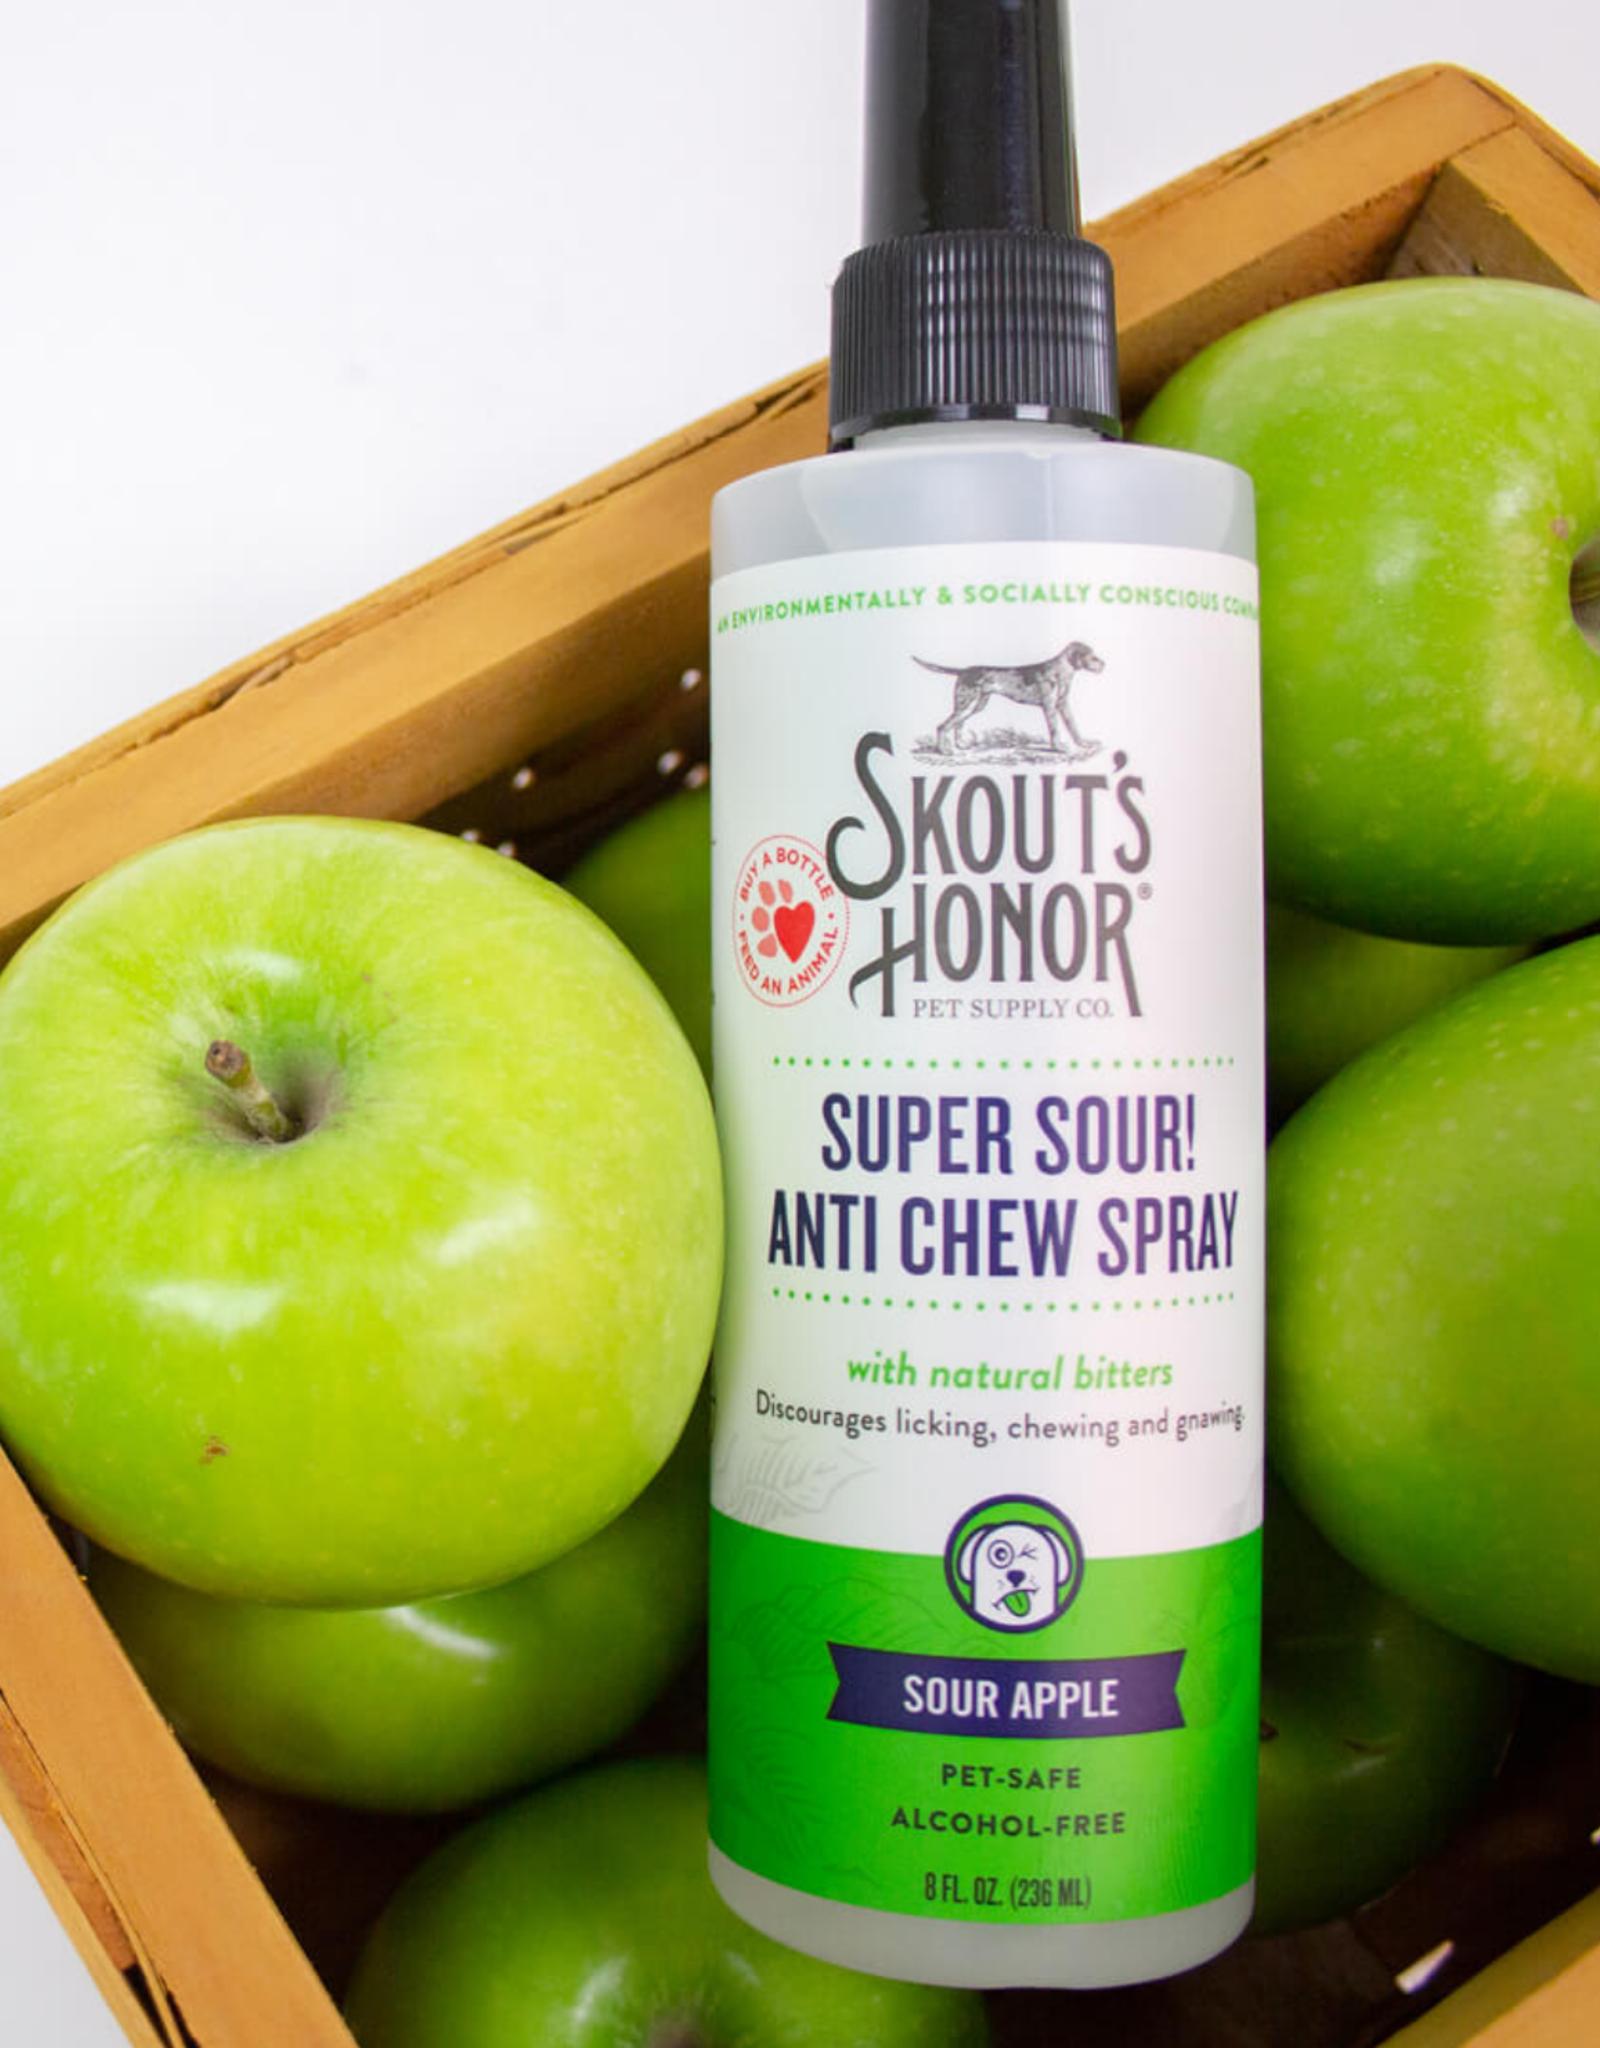 Skout's Honor Skout's Honor Super Sour! Anti Chew